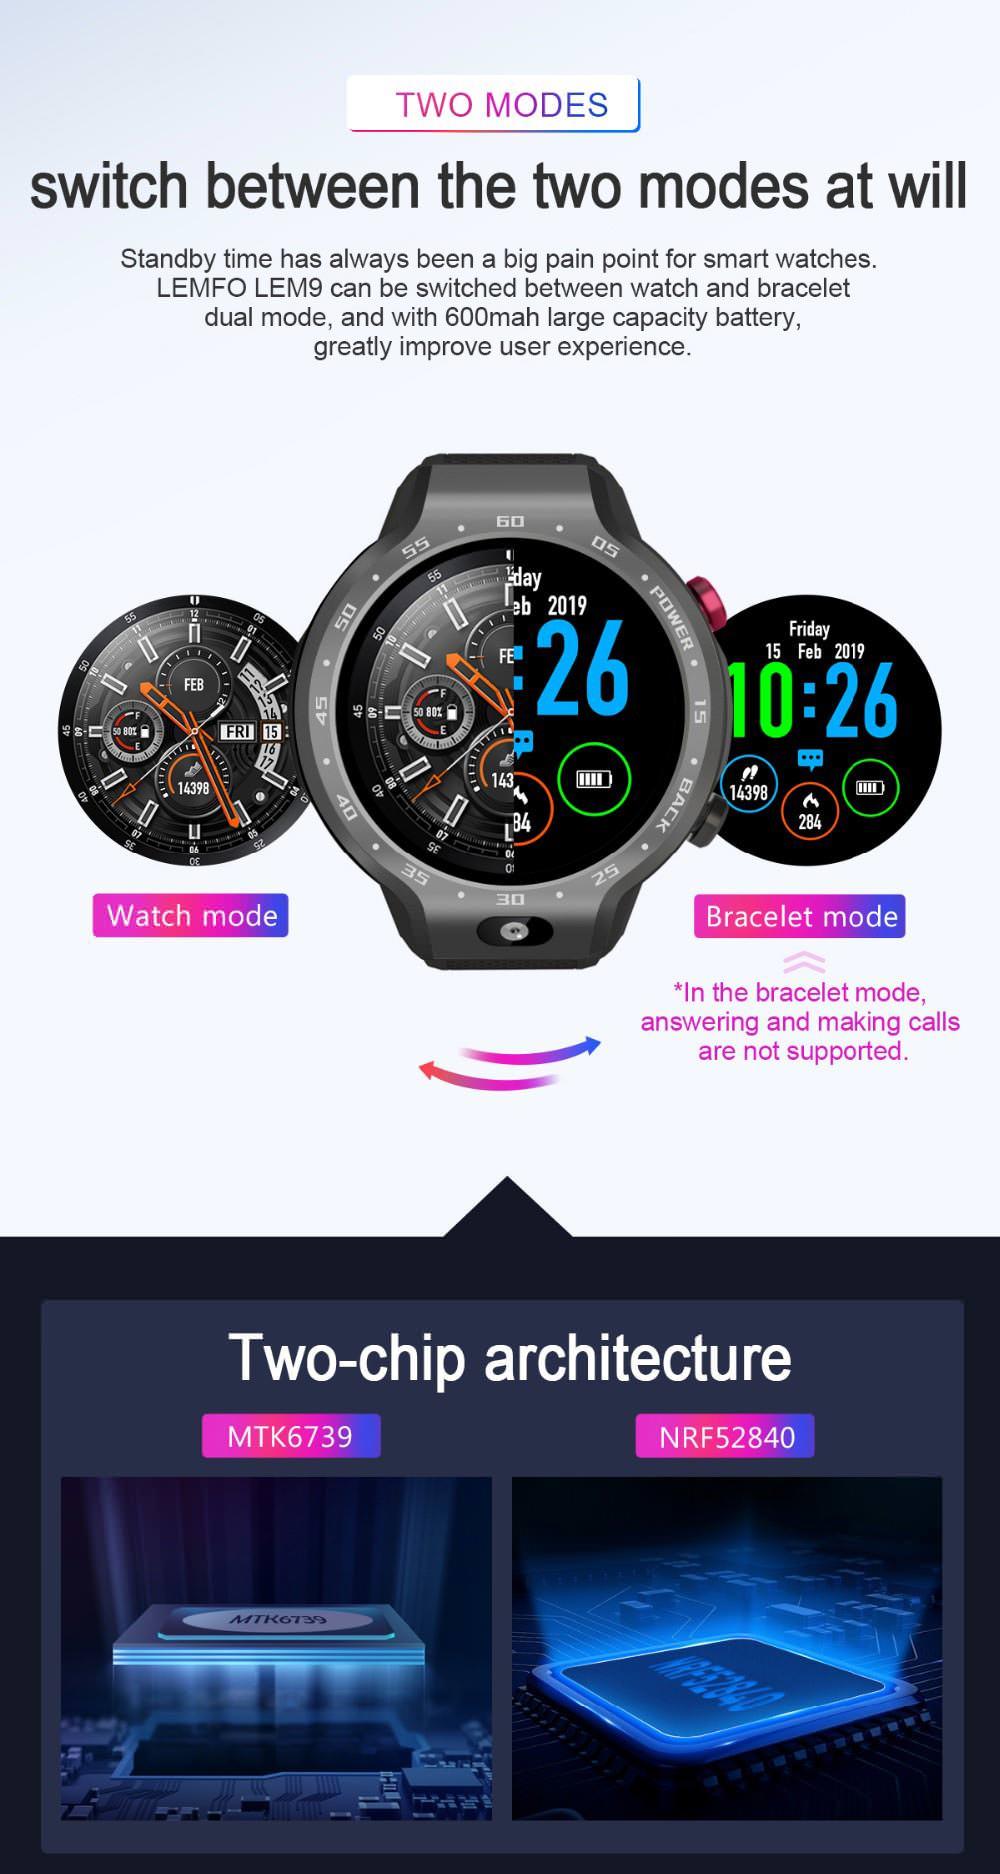 lemfo lem9 sports smartwatch